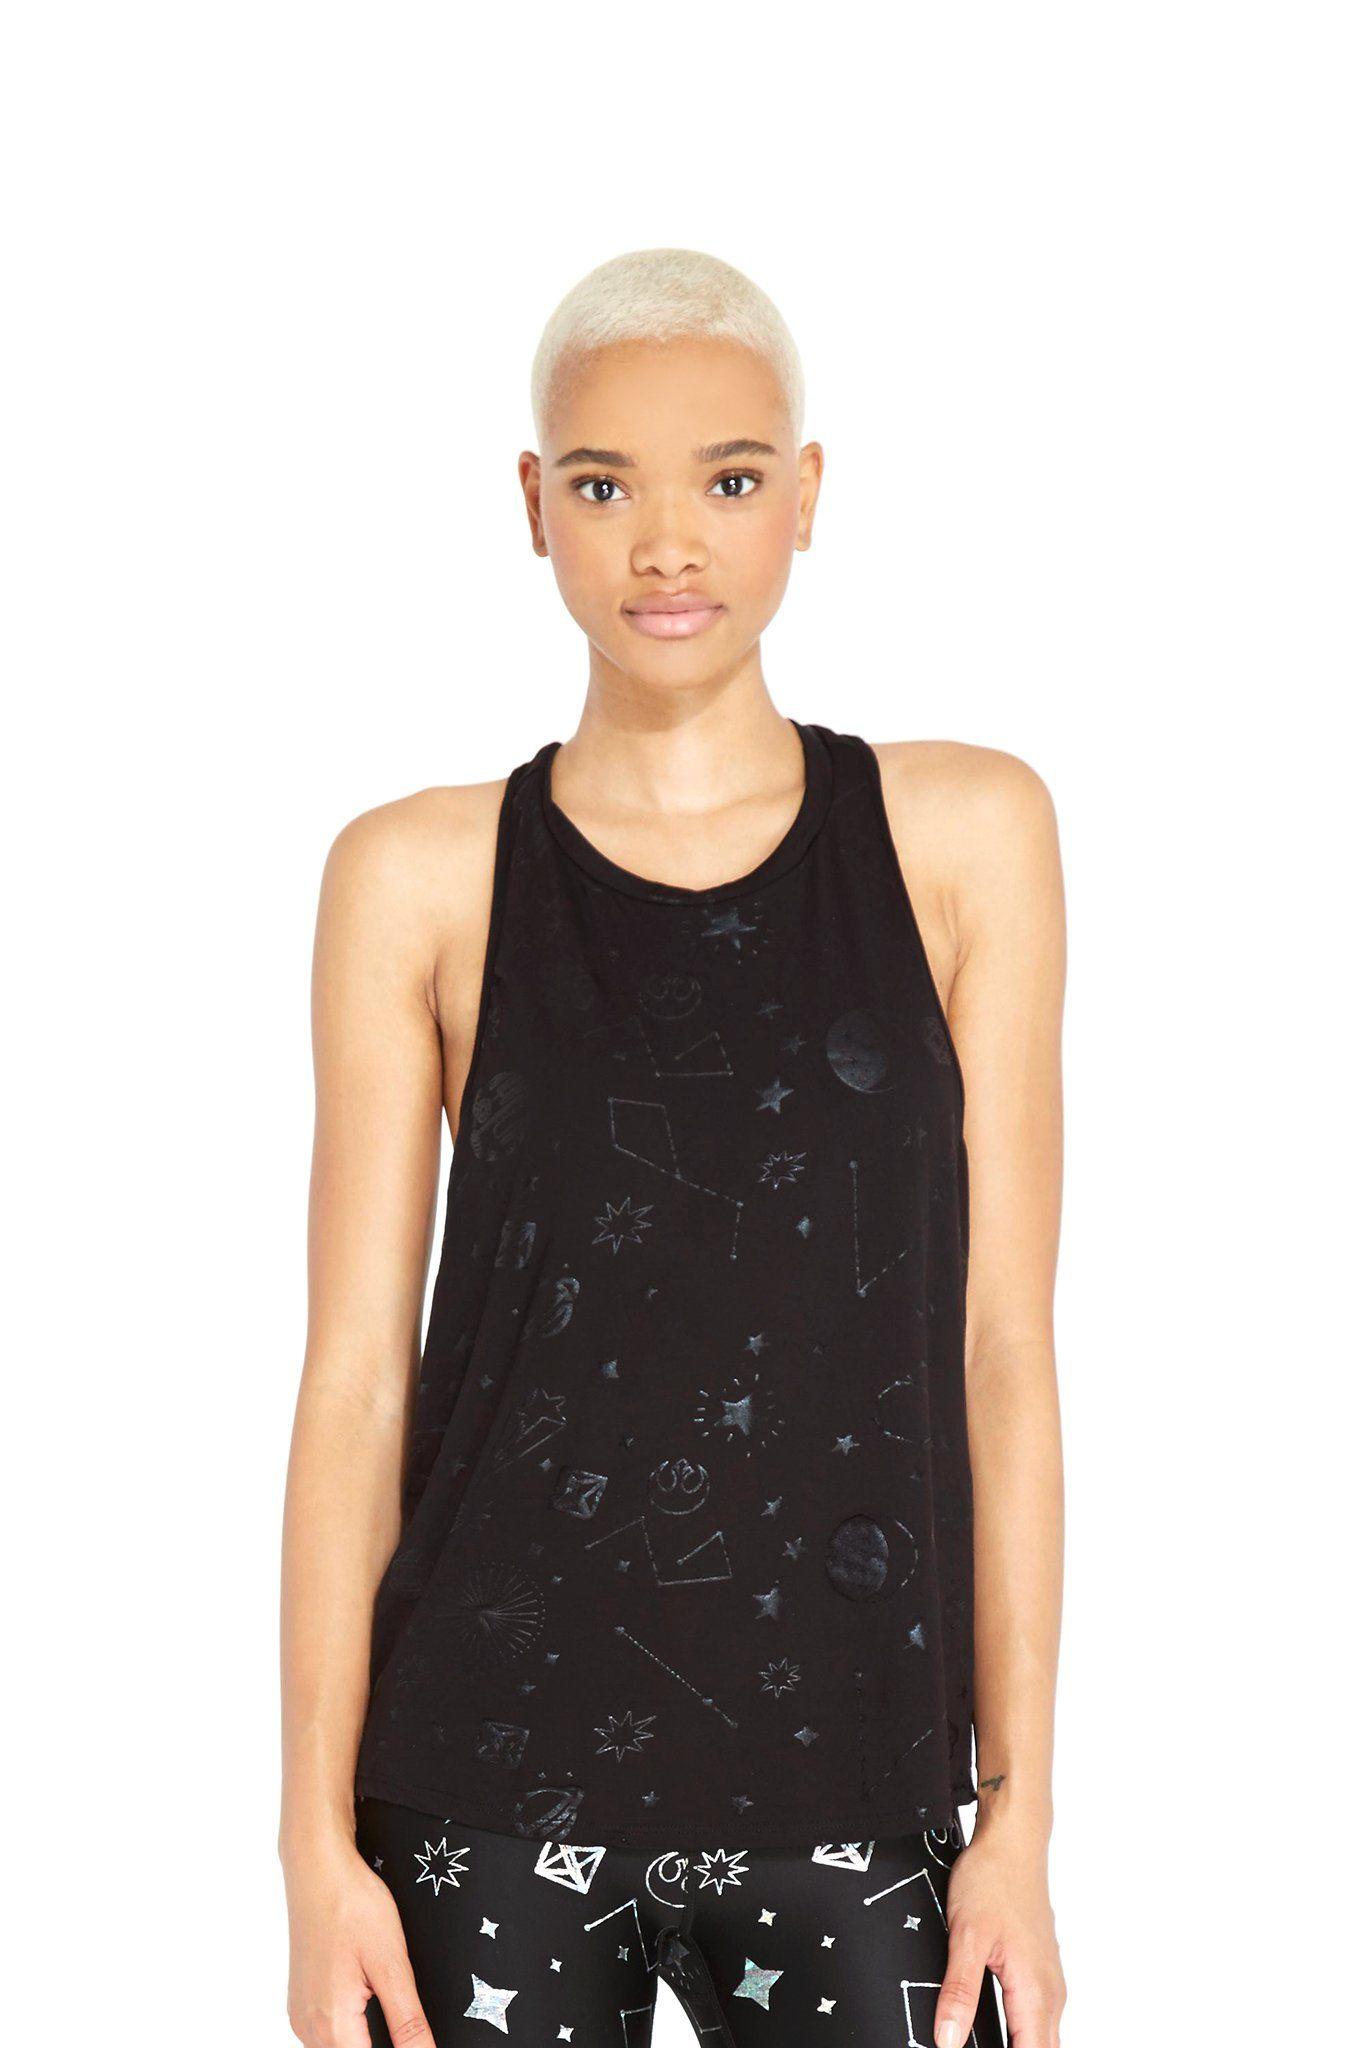 cf90f759c2697 Women's Terez x Star Wars Rebel Galaxy Foil Racerback Tank ⭐️The Kessel  Runway ⭐ Star Wars fashion ⭐ Geek Fashion ⭐ Star Wars Style ⭐ Geek ...